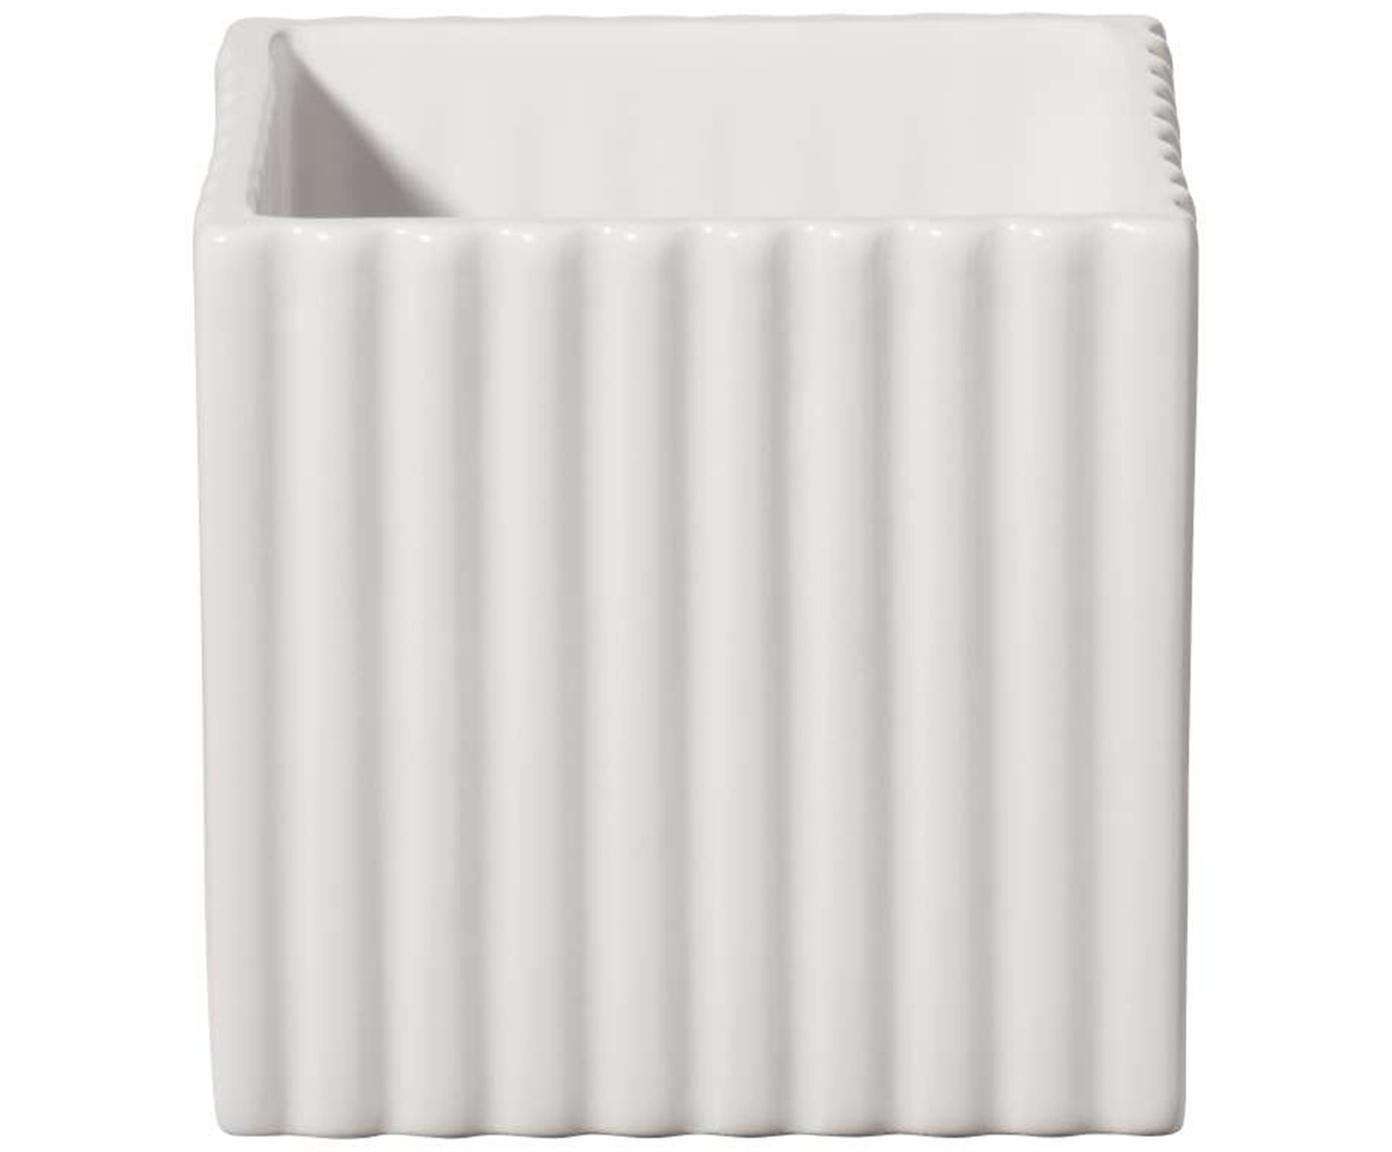 Maceta Quadro, Cerámica, Blanco, An 10 x Al 10 cm